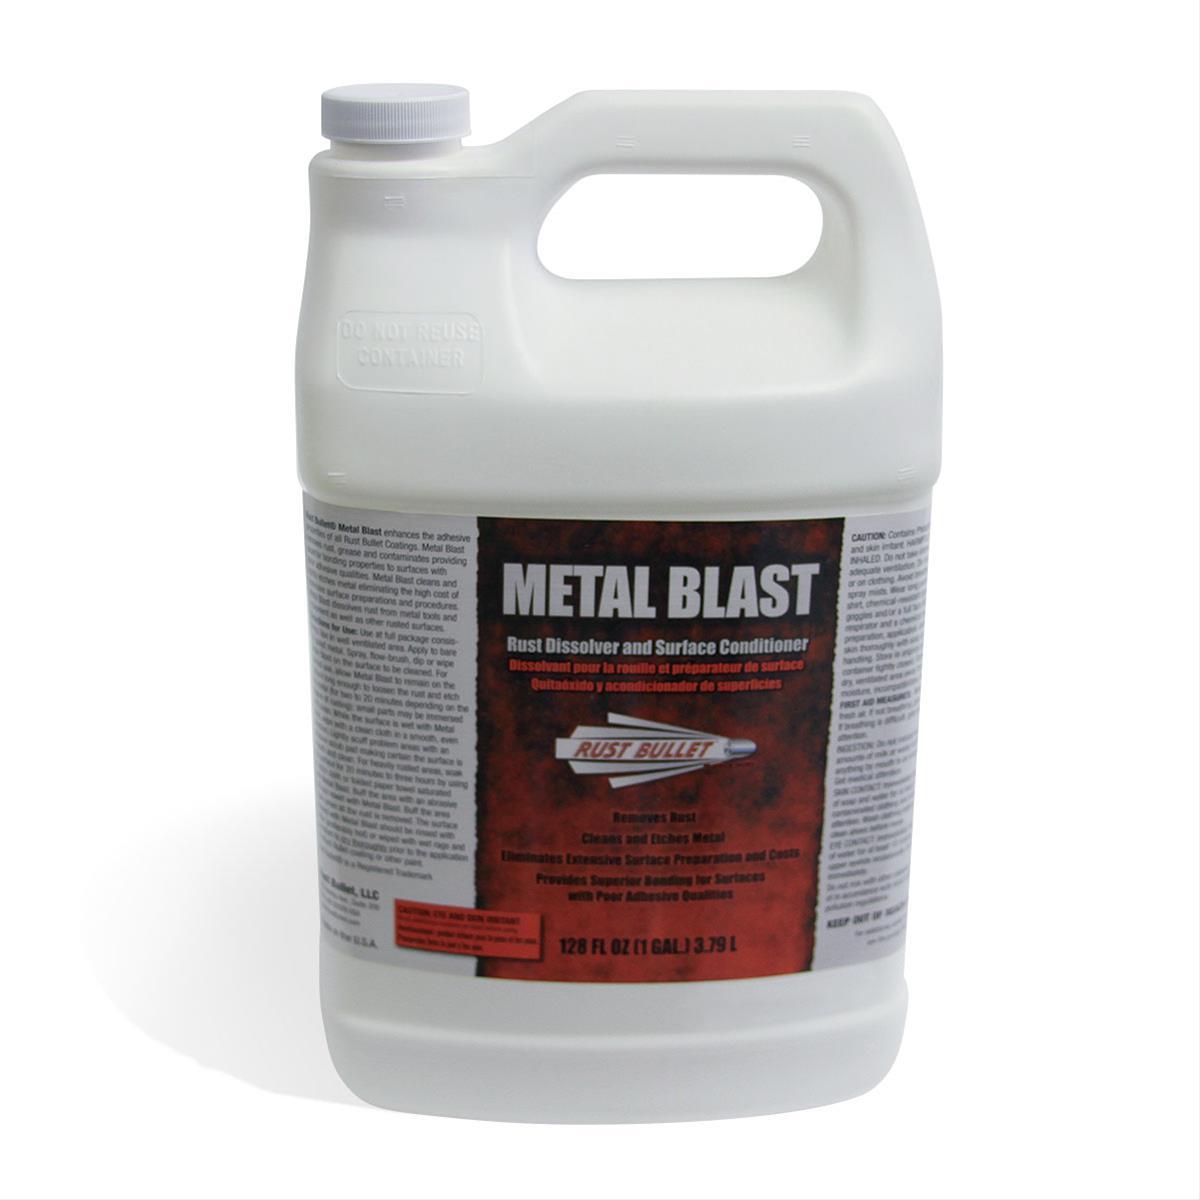 rust bullet cleaning solution metal blast 1 gallon each ebay. Black Bedroom Furniture Sets. Home Design Ideas